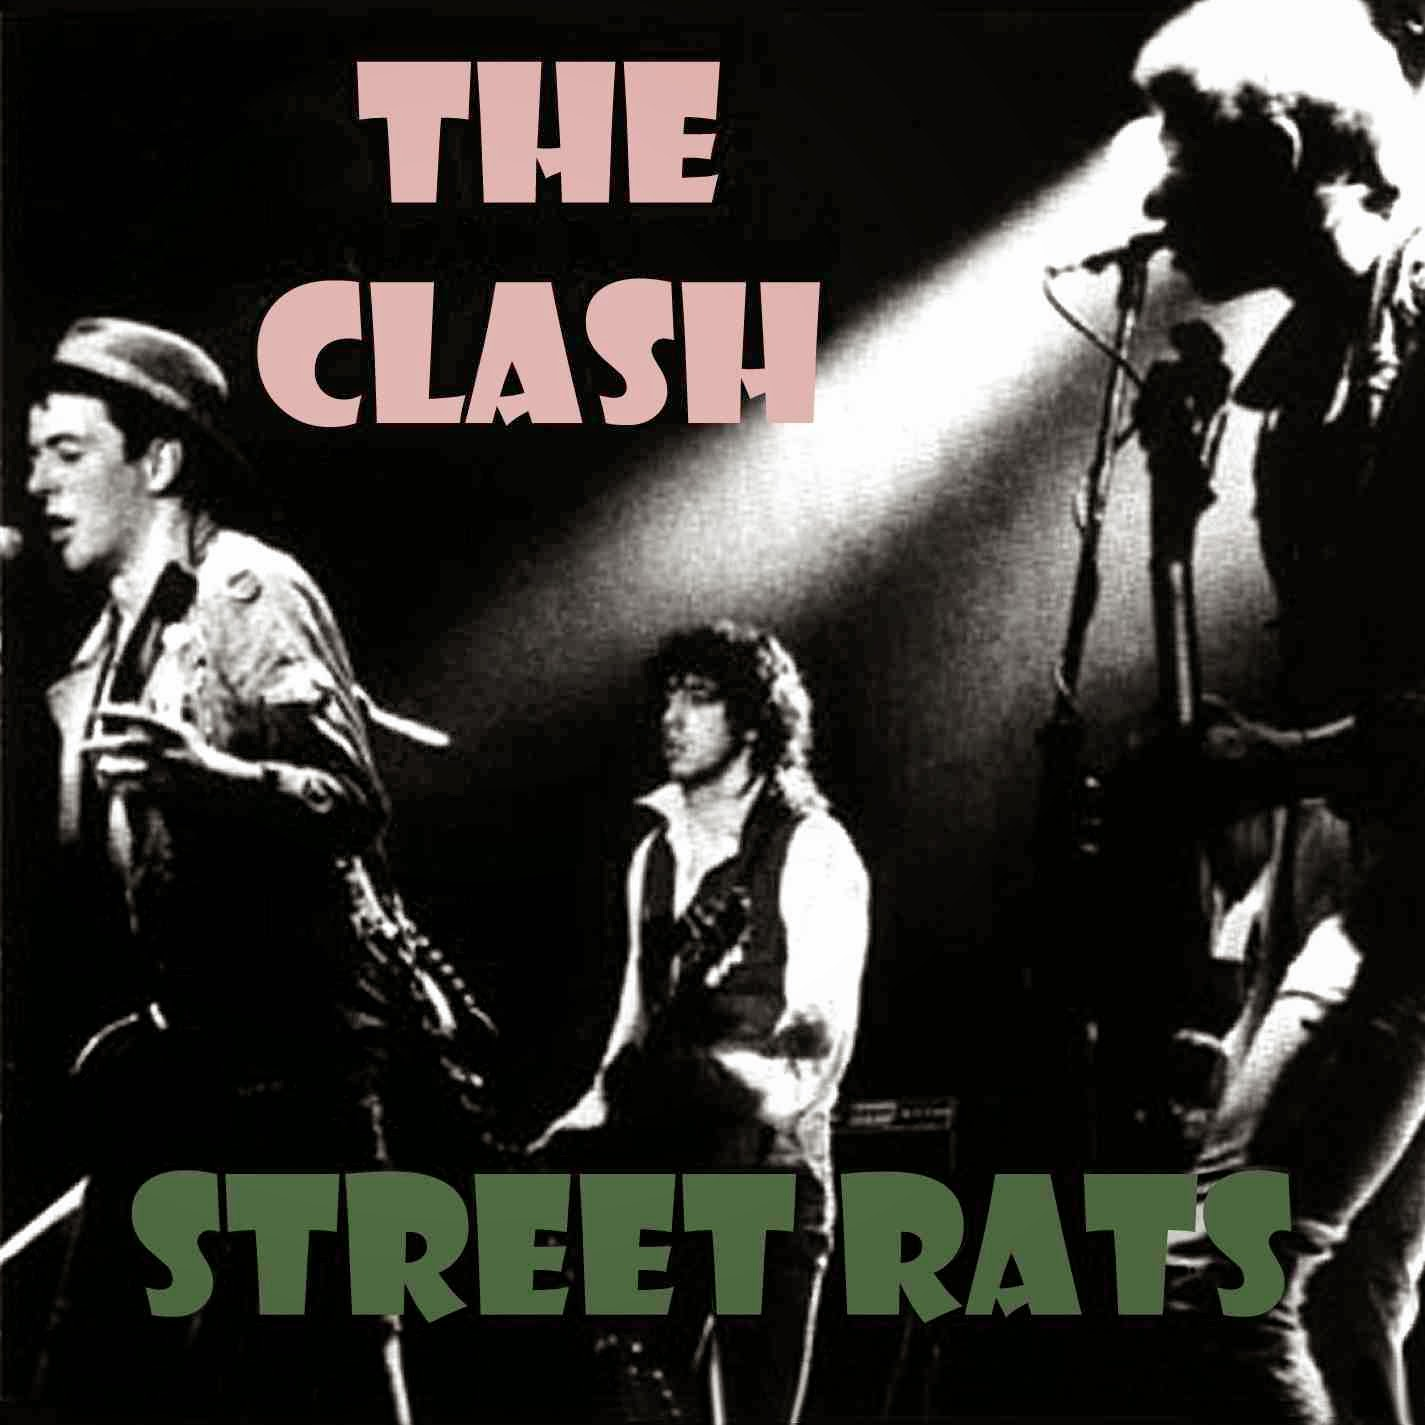 Plumdusty s page pink floyd 1975 06 12 spectrum theater philadelphia - Clash Street Rats